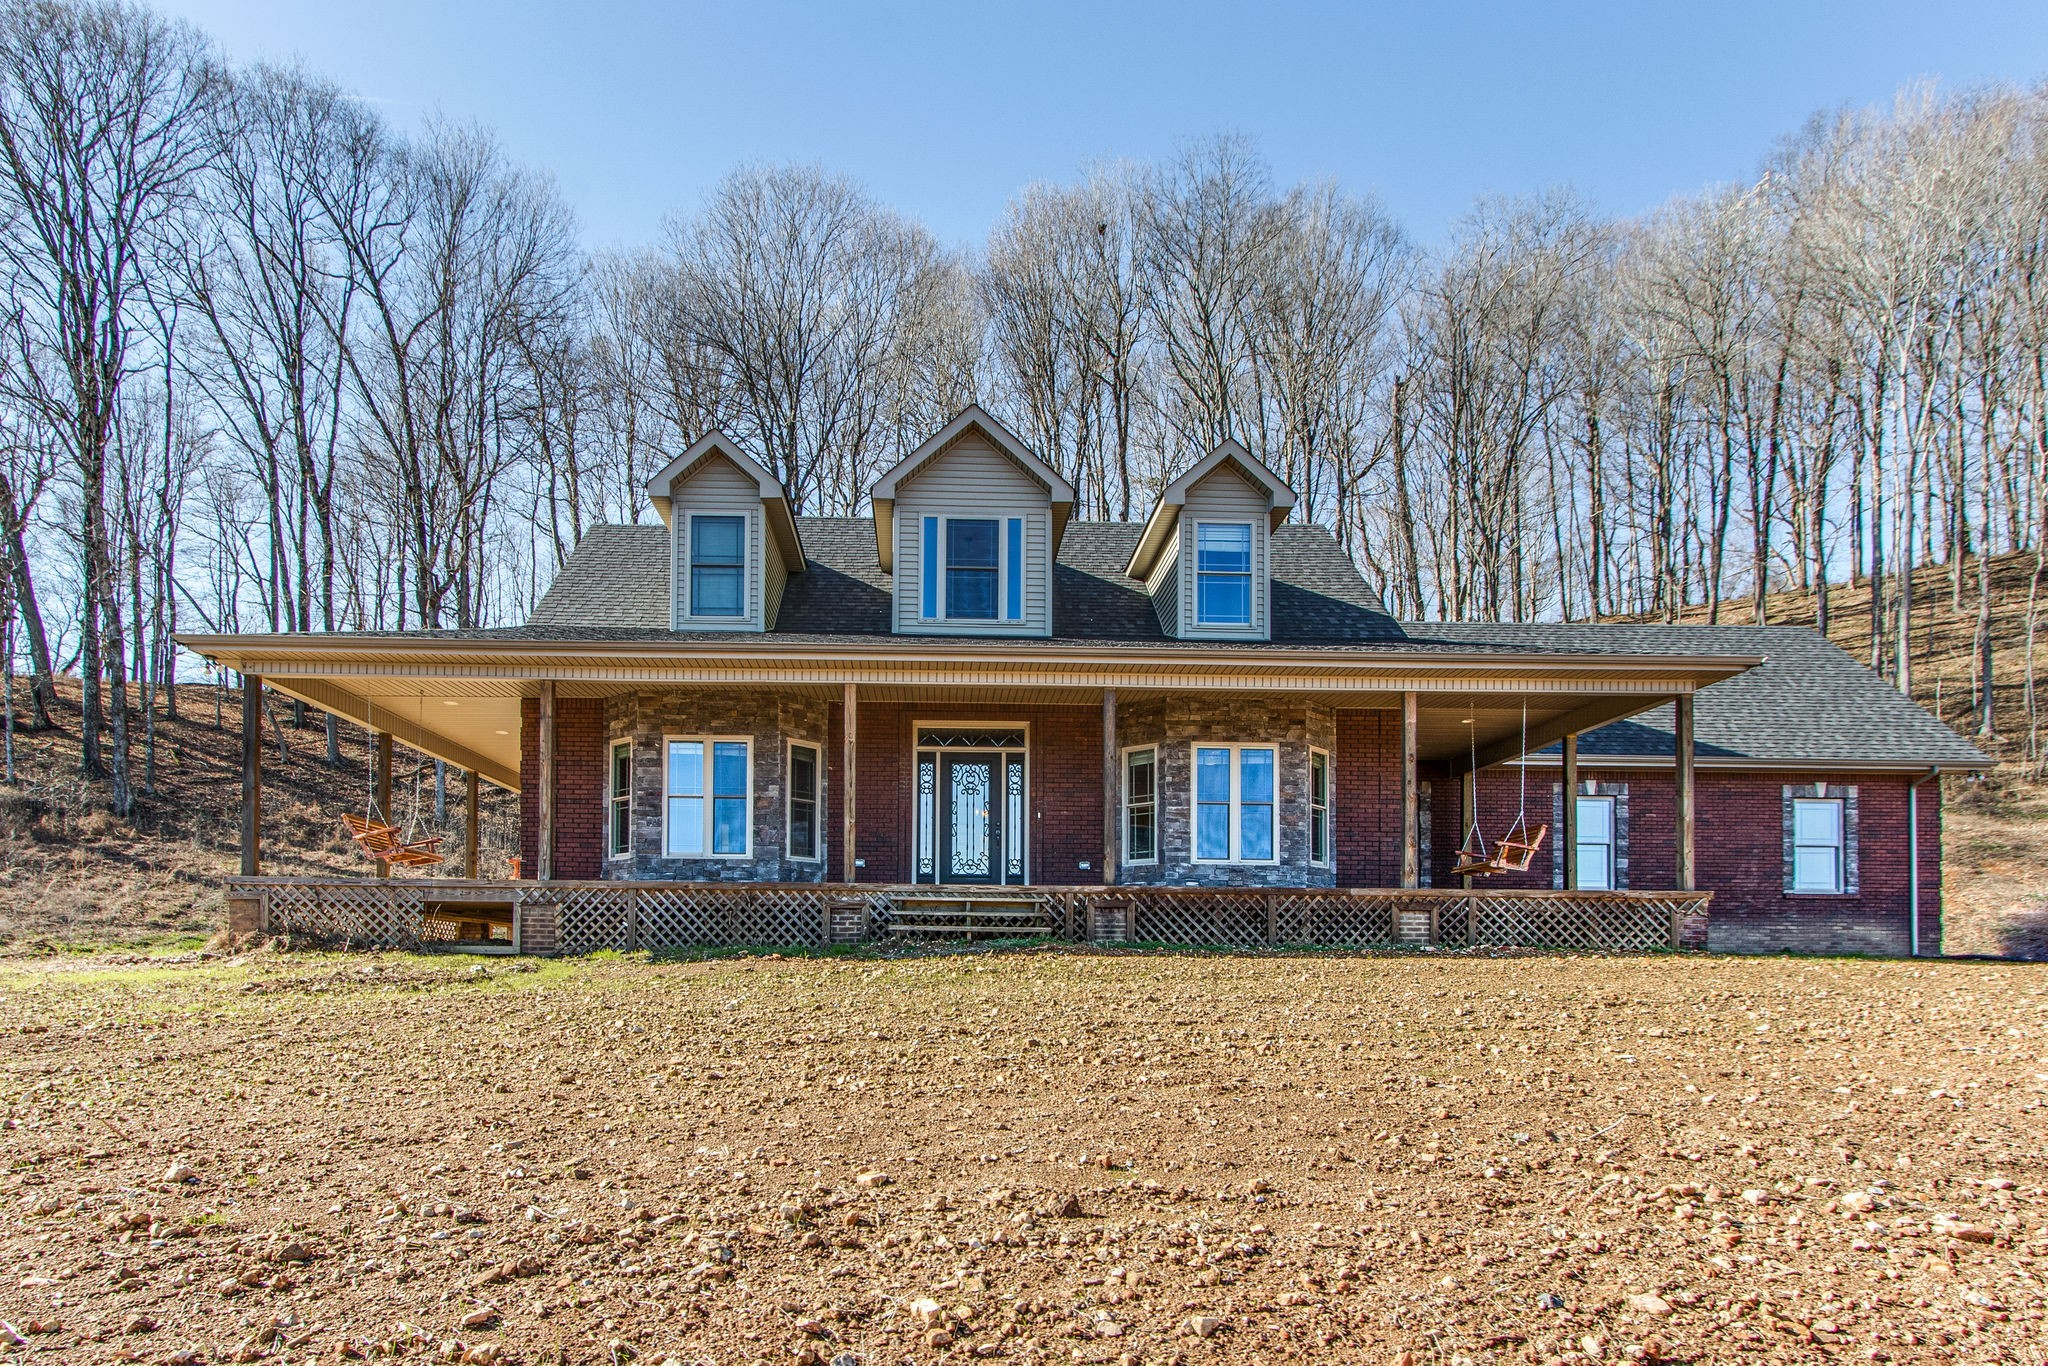 1601 French Brantley Rd, Wartrace, TN 37183 - Wartrace, TN real estate listing